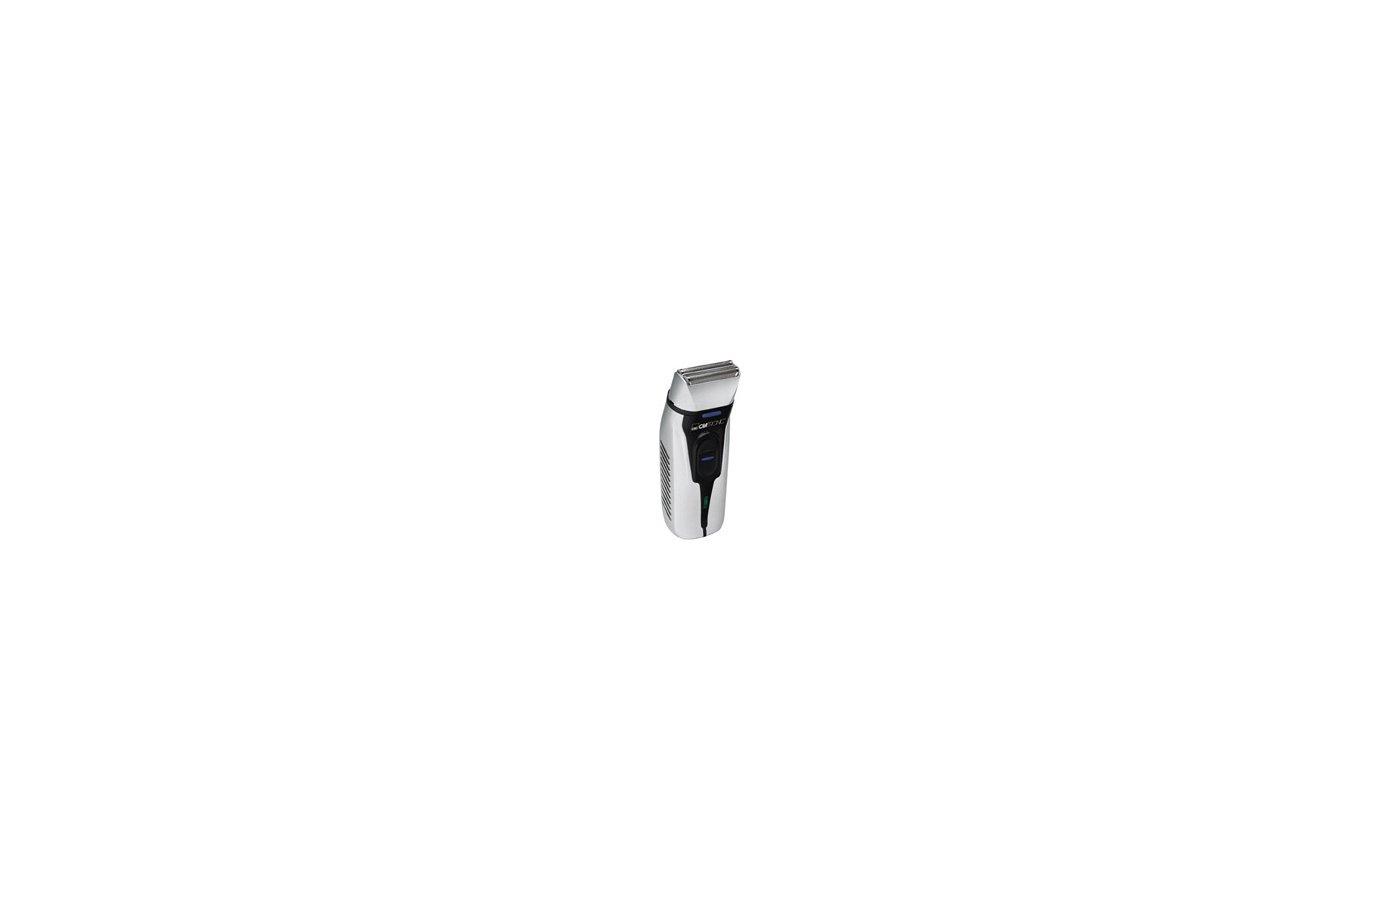 Сеточные бритвы CLATRONIC HR 2603 N silber-grau